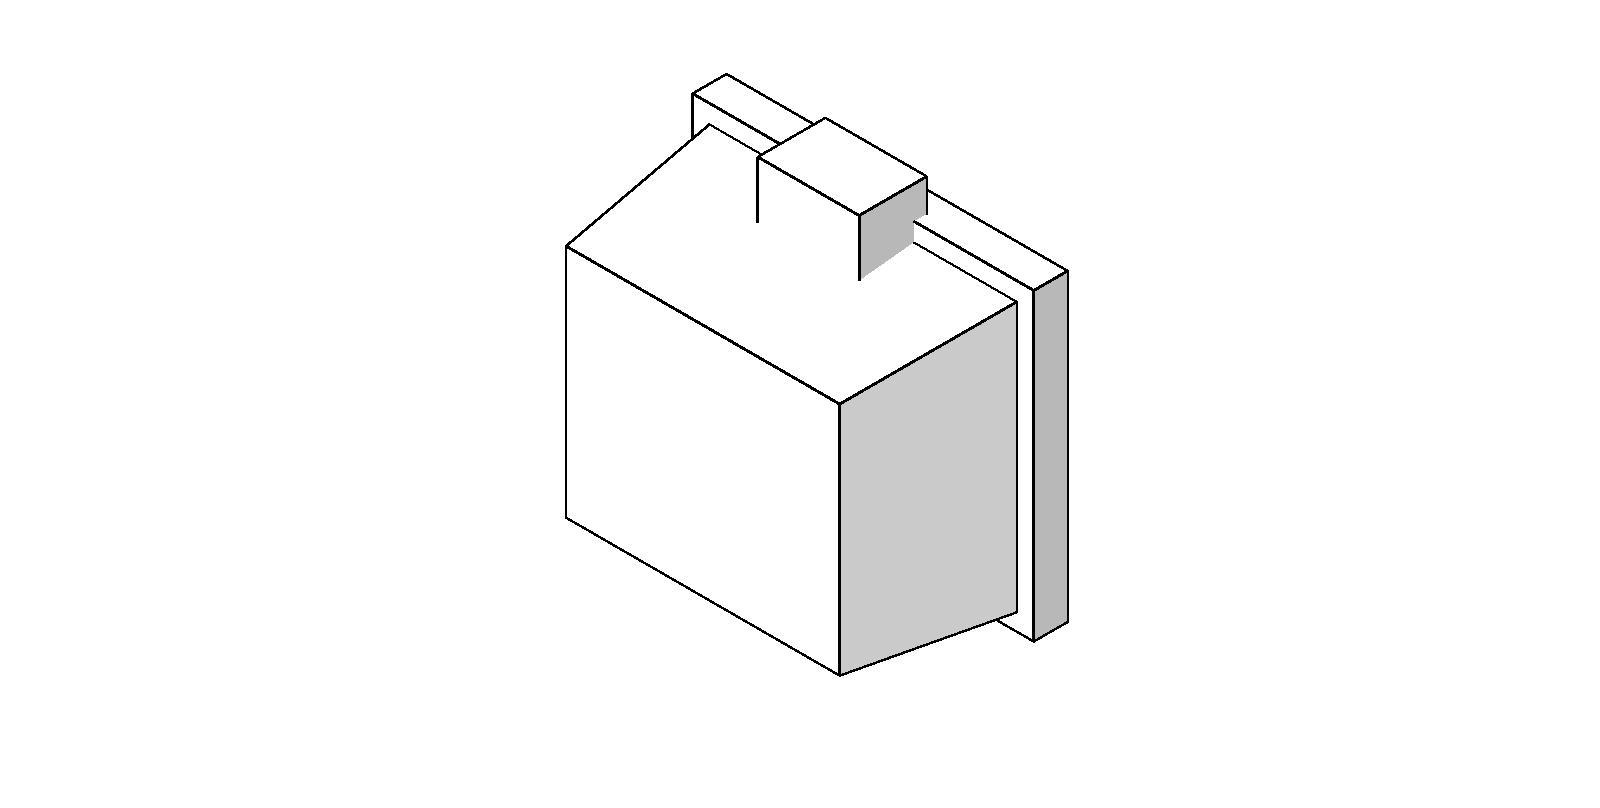 Contura Illuminated Switch Wiring Utv Diagrams A Light 4 Terminal Toggle Diagram 6 Rocker